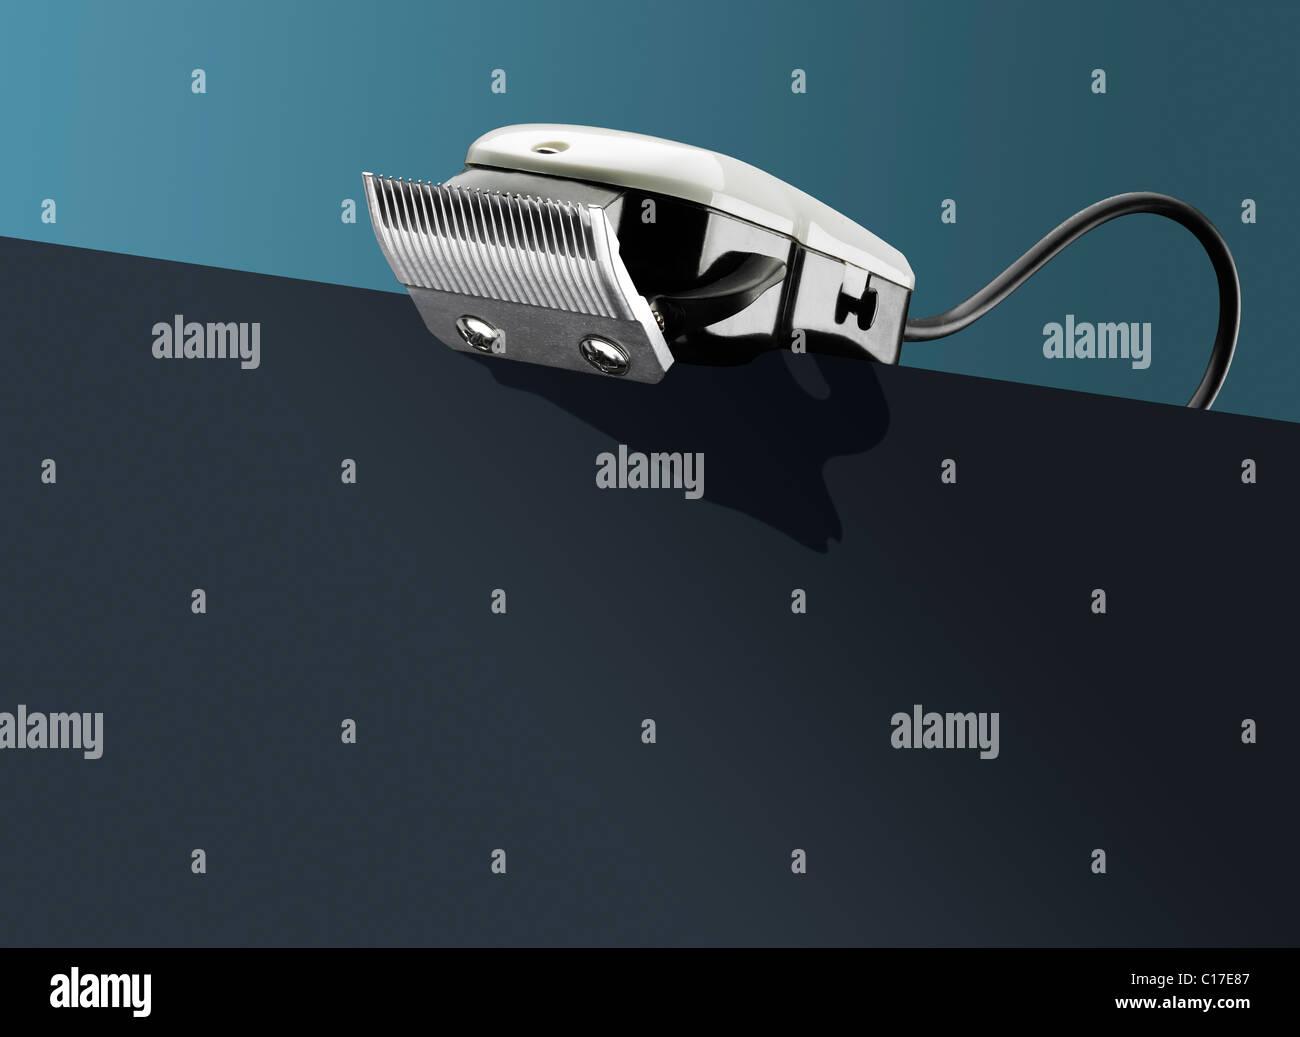 Cortapelos en - conceptual Imagen De Stock